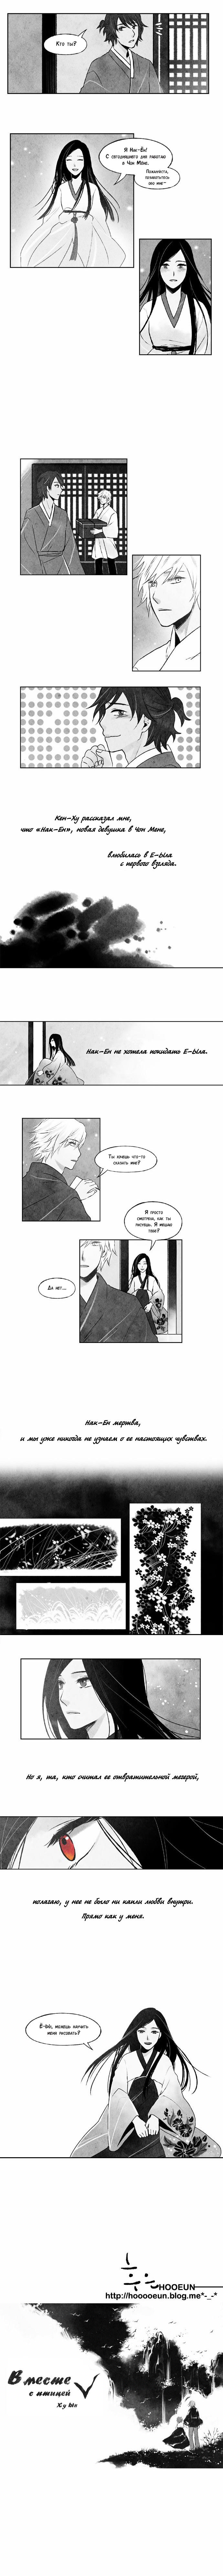 https://r1.ninemanga.com/comics/pic2/39/22503/416366/1532884210960.jpg Page 4